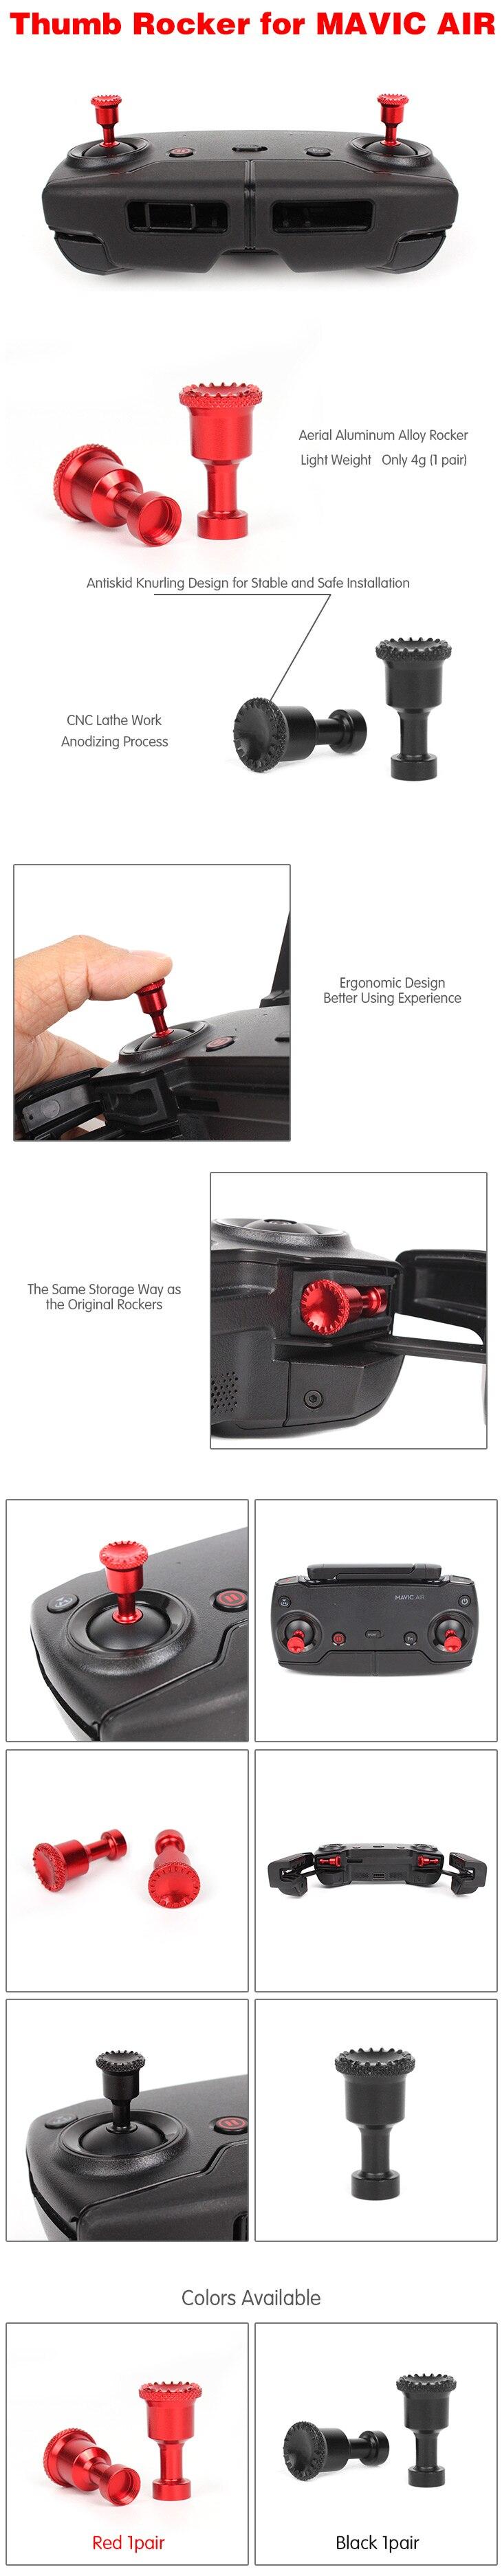 Red Light On Dji Controller